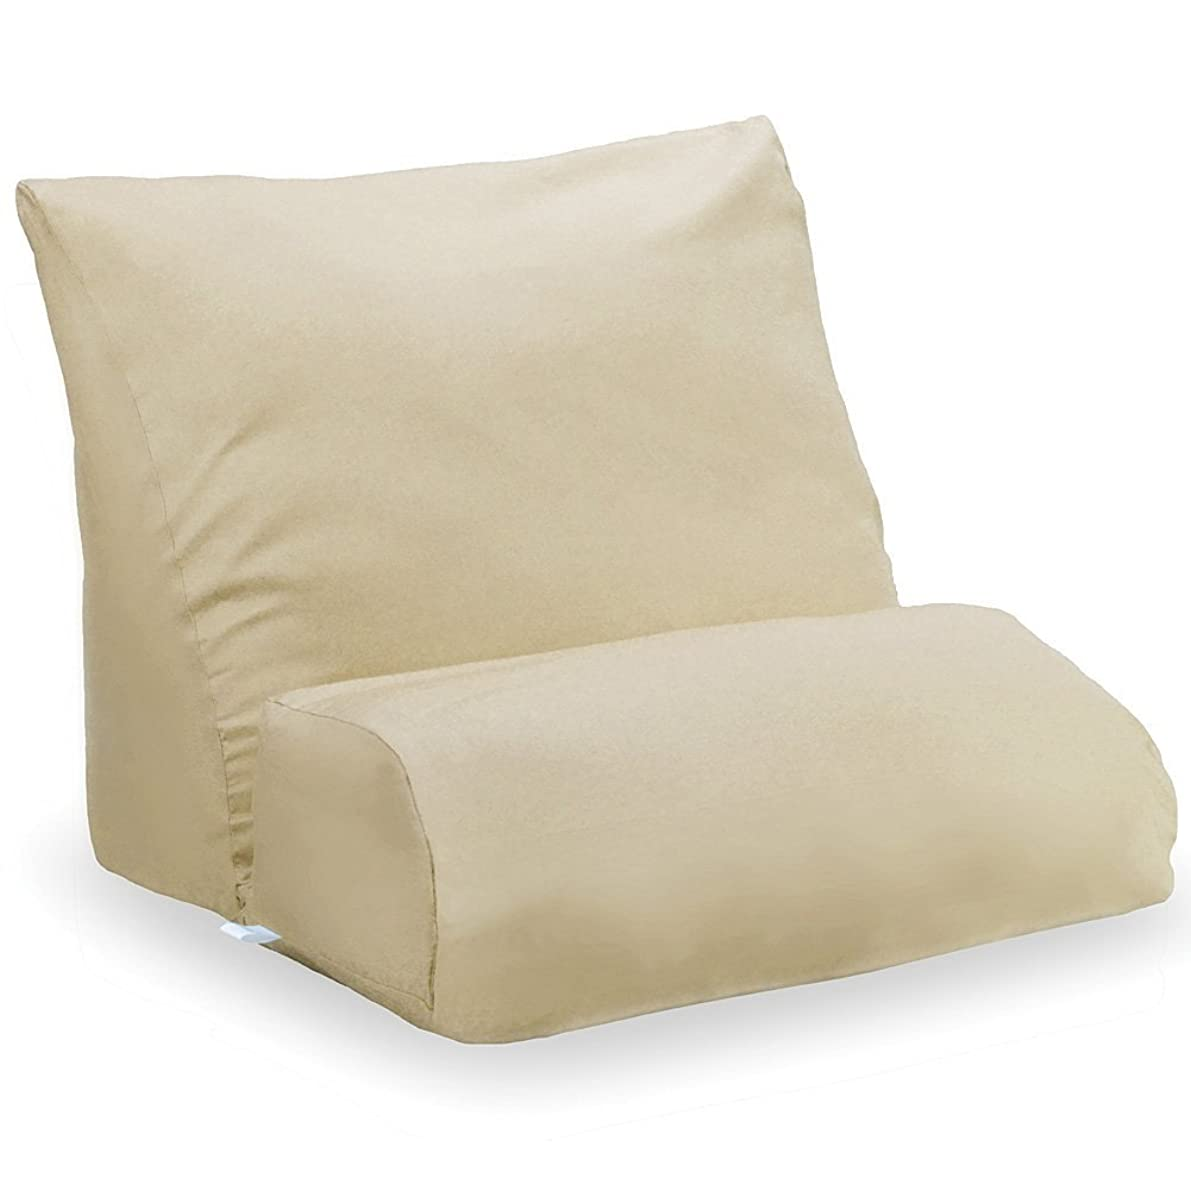 Trenton Gifts 10-in-1 Flip Pillow Case | White